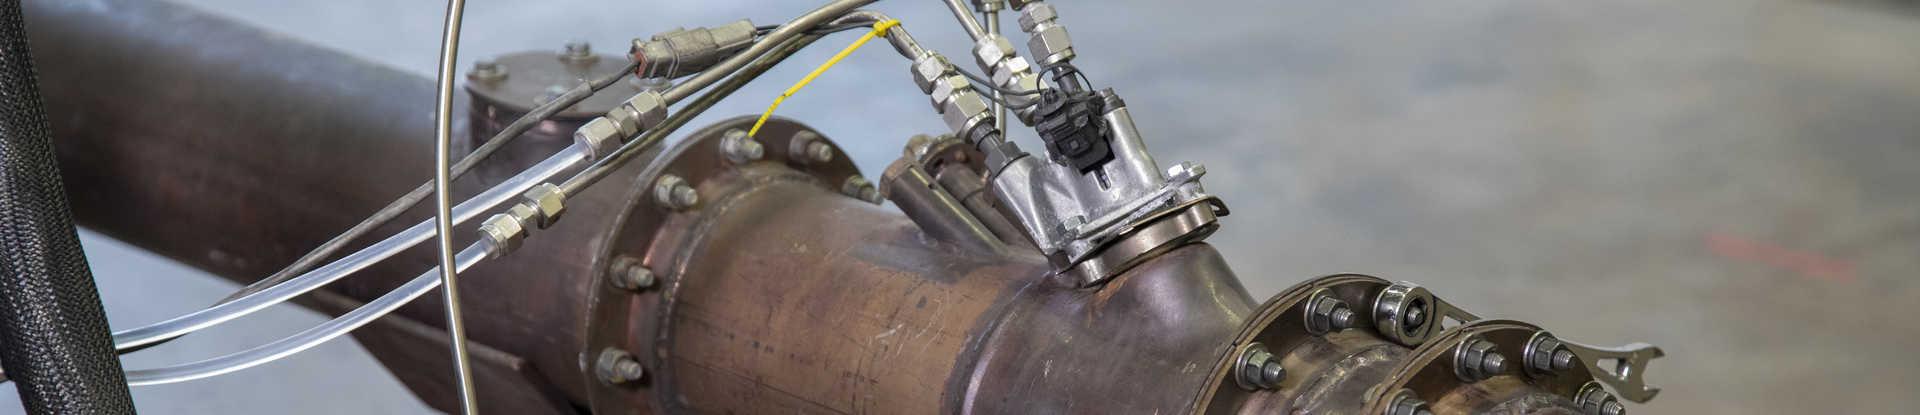 Press Release-SwRI wins R&D 100 Award for Catalyzed Diesel Exhaust Fluid technology